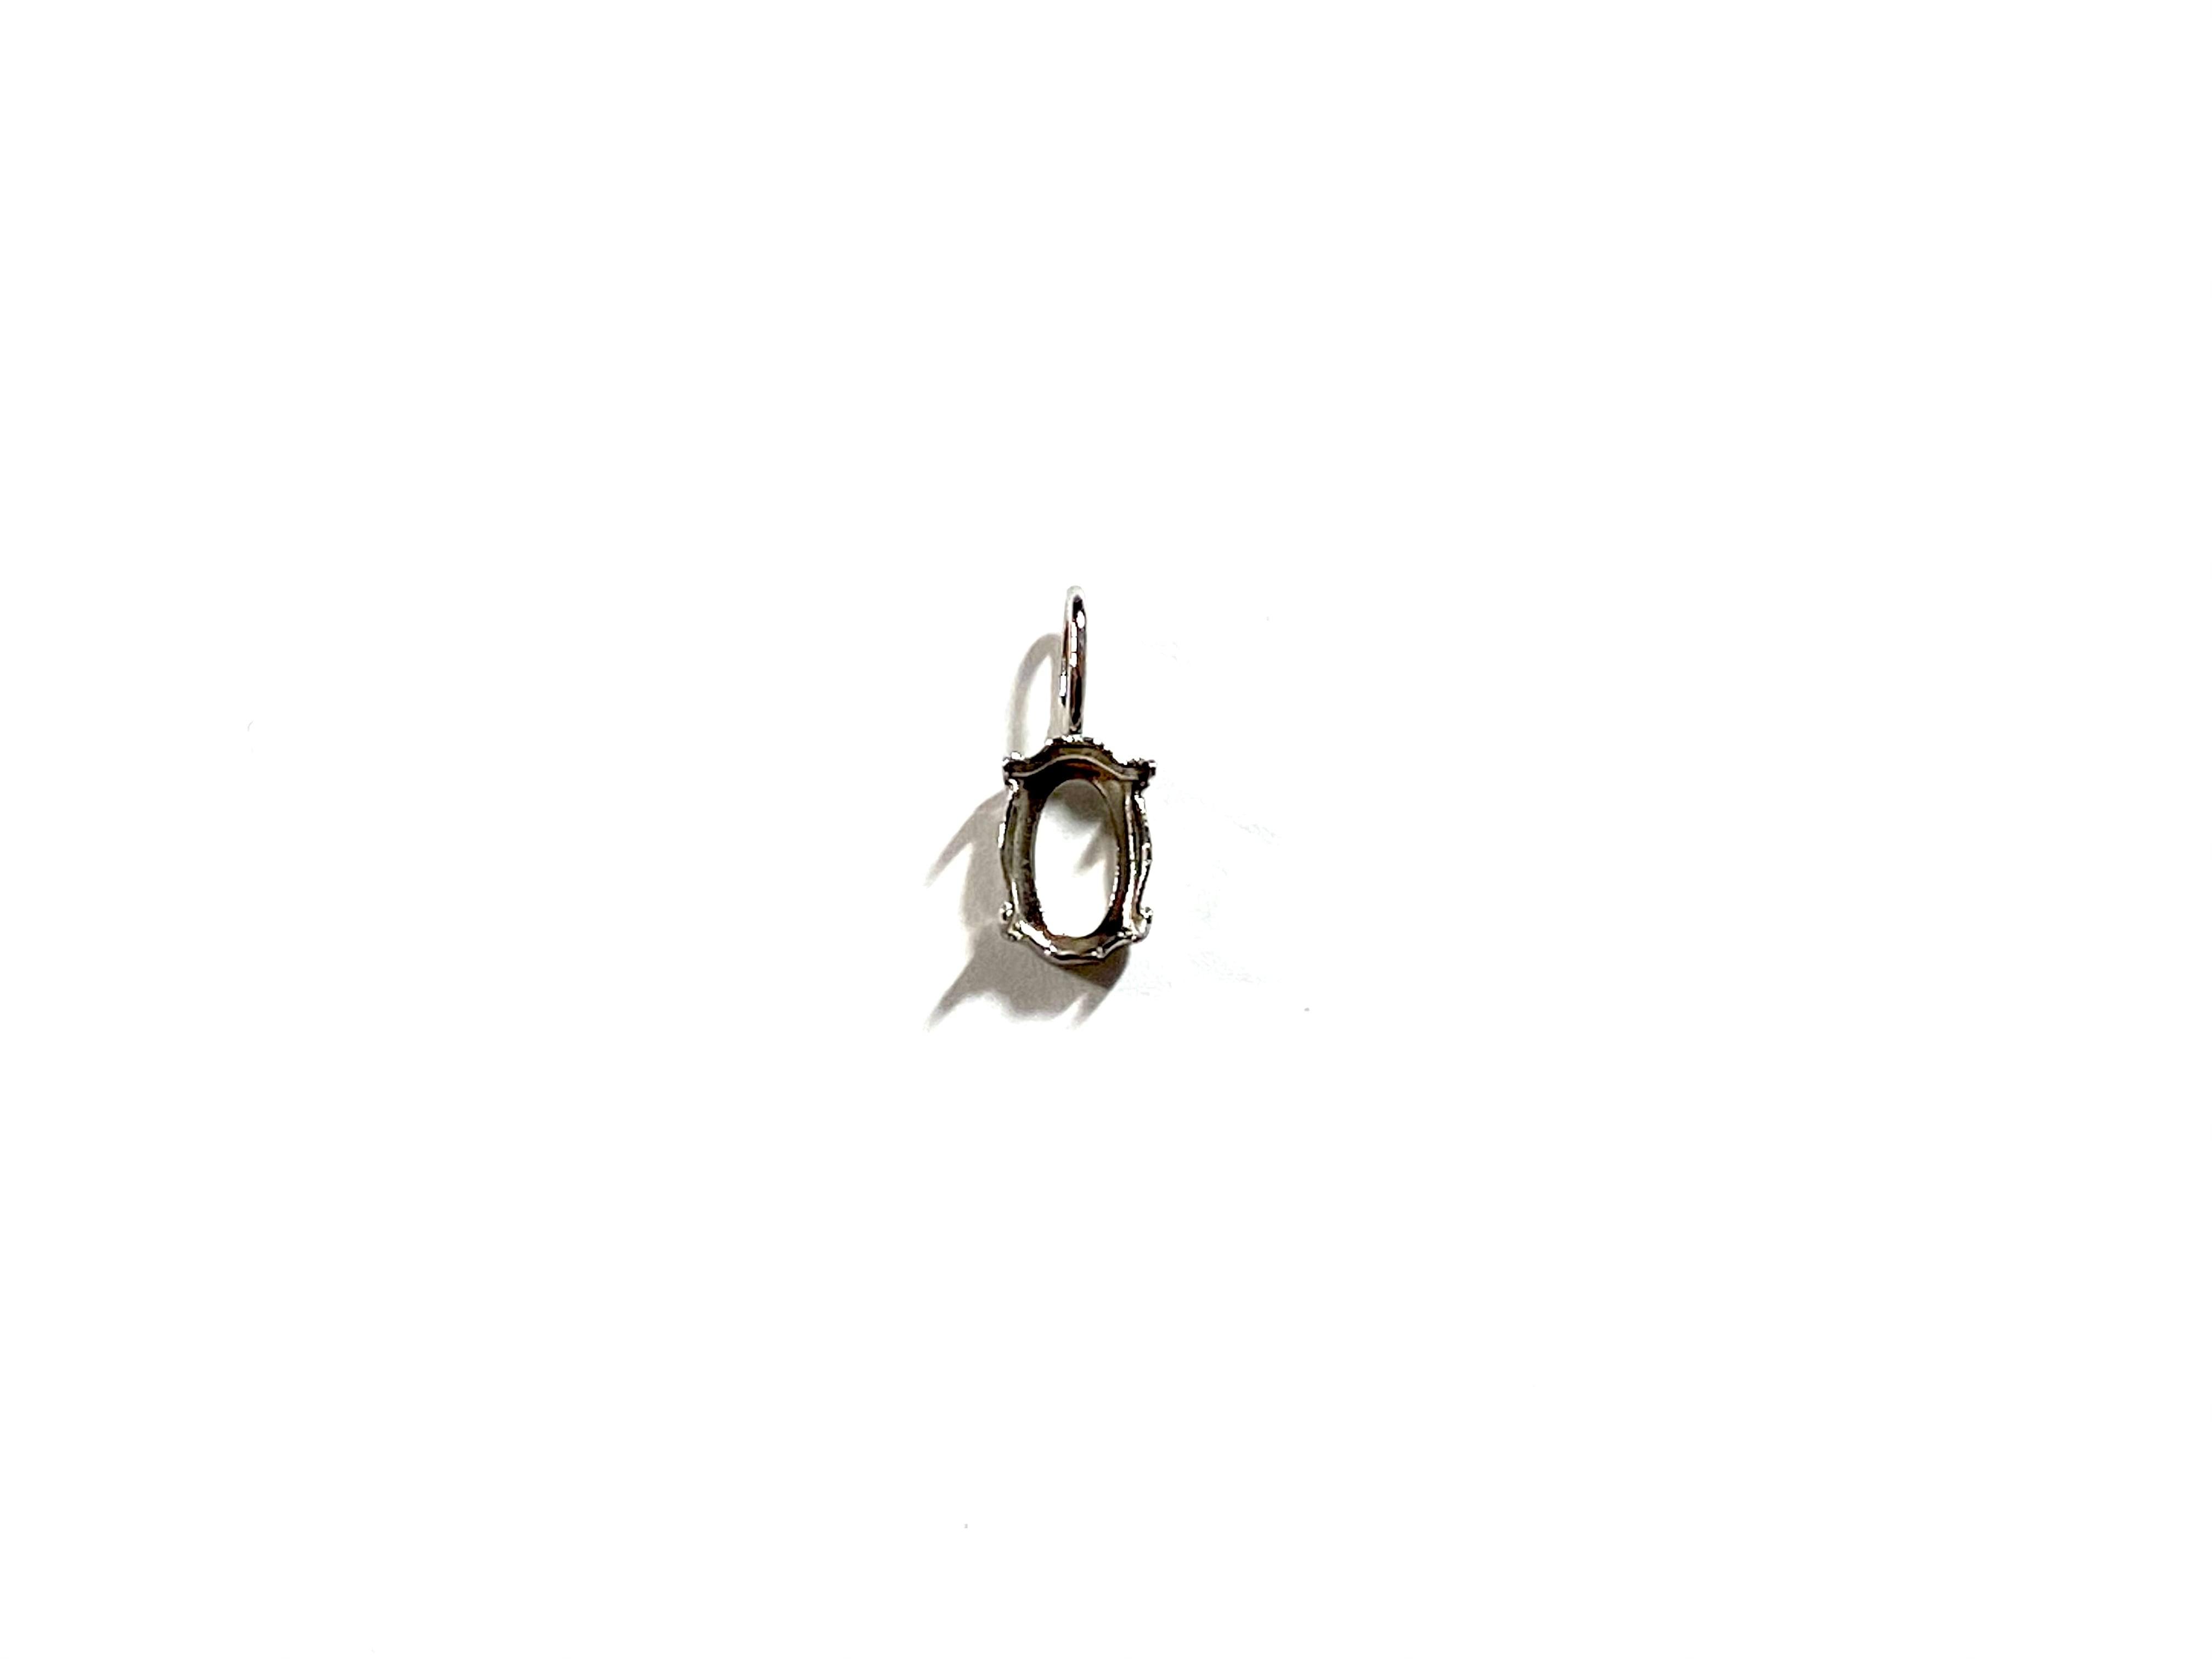 【K10WG】『タテ6mm ヨコ4mm 』オーバルカット対応空枠 [空枠No,5]